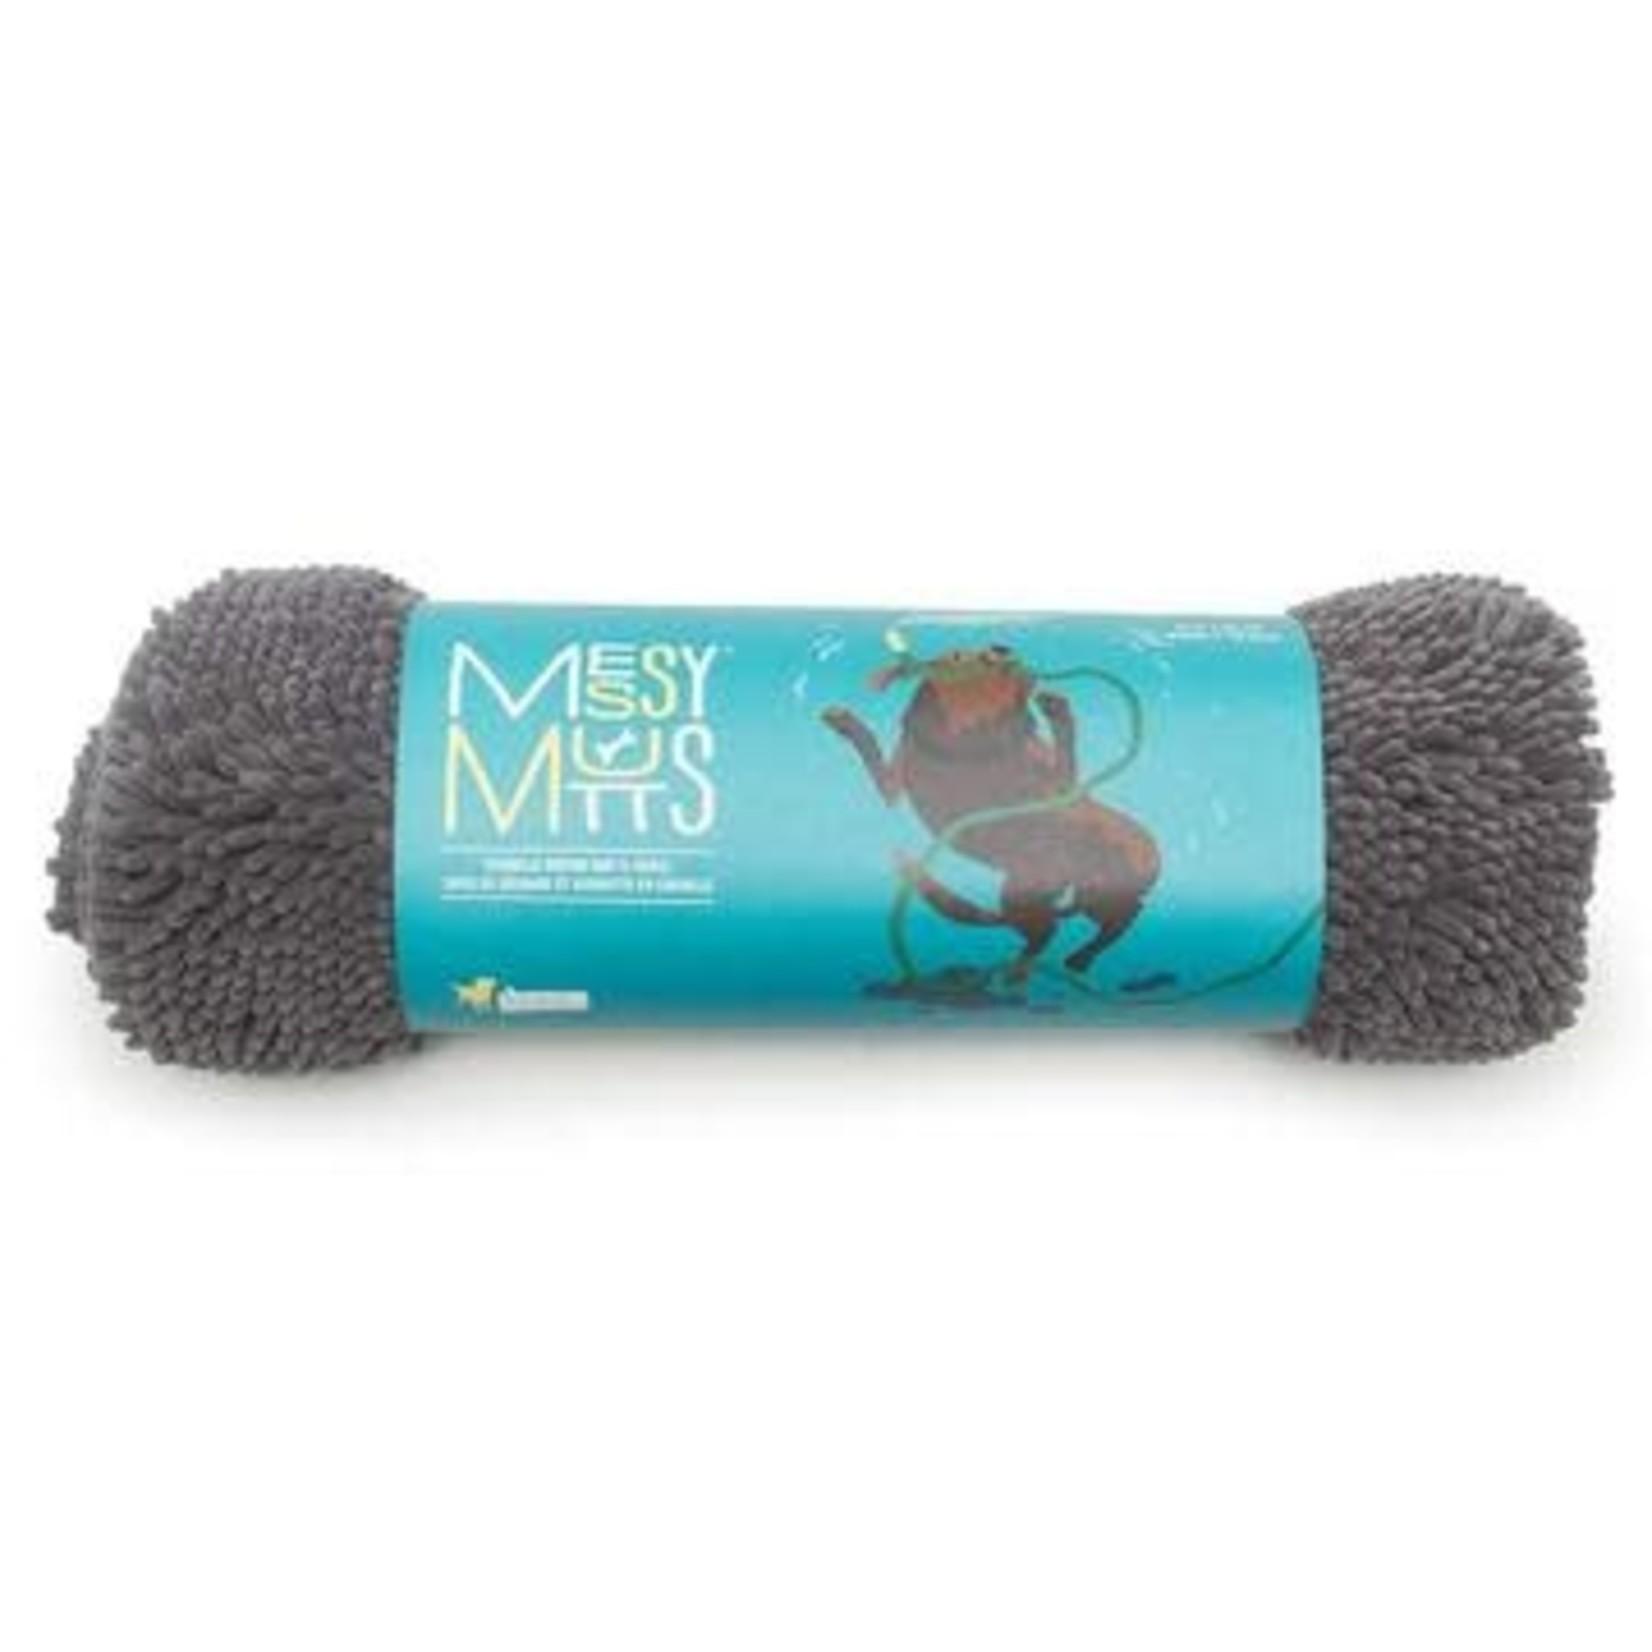 Messy Mutts Messy Mutts Drying Mat & Towel Cool Grey Medium